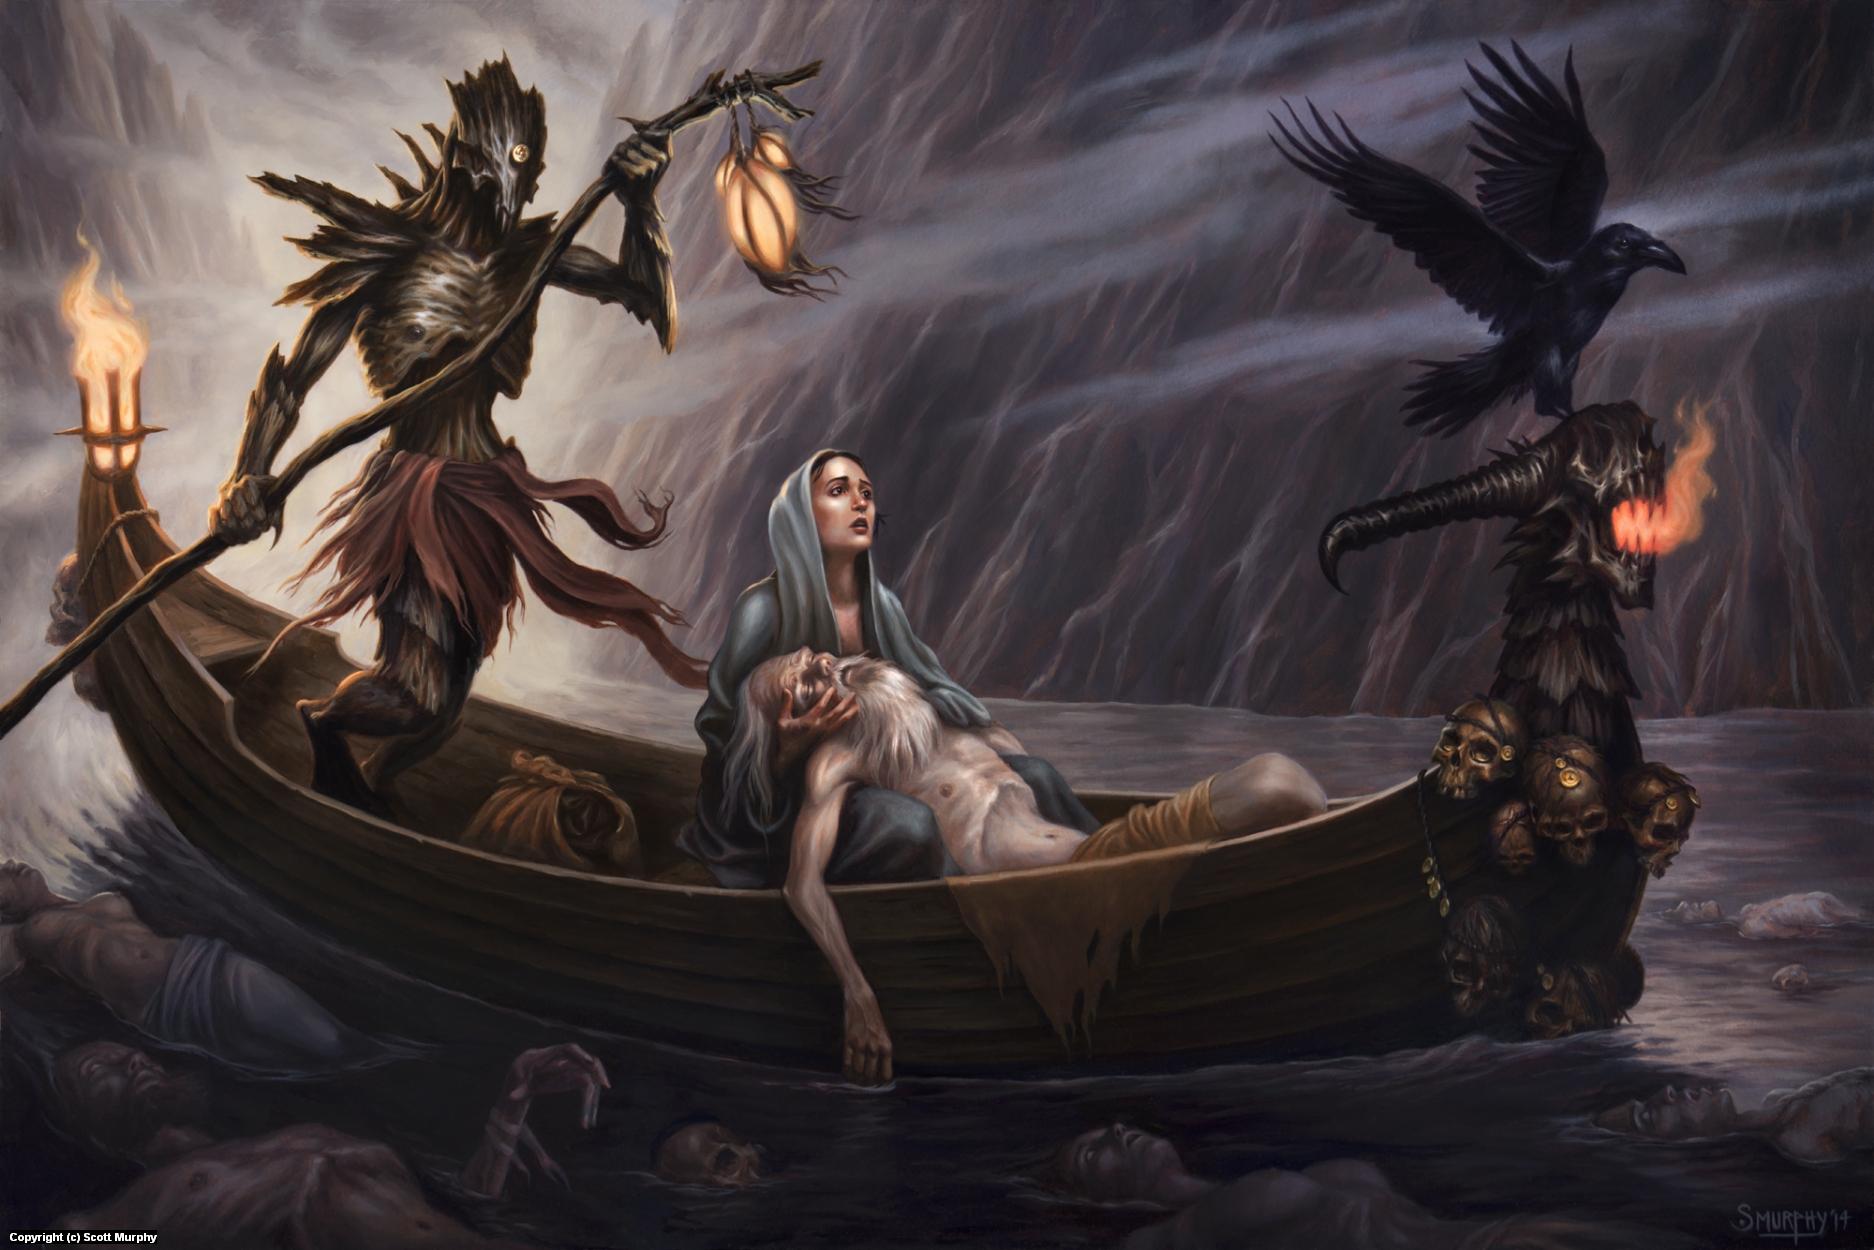 The Ferryman of Hades Artwork by Scott Murphy